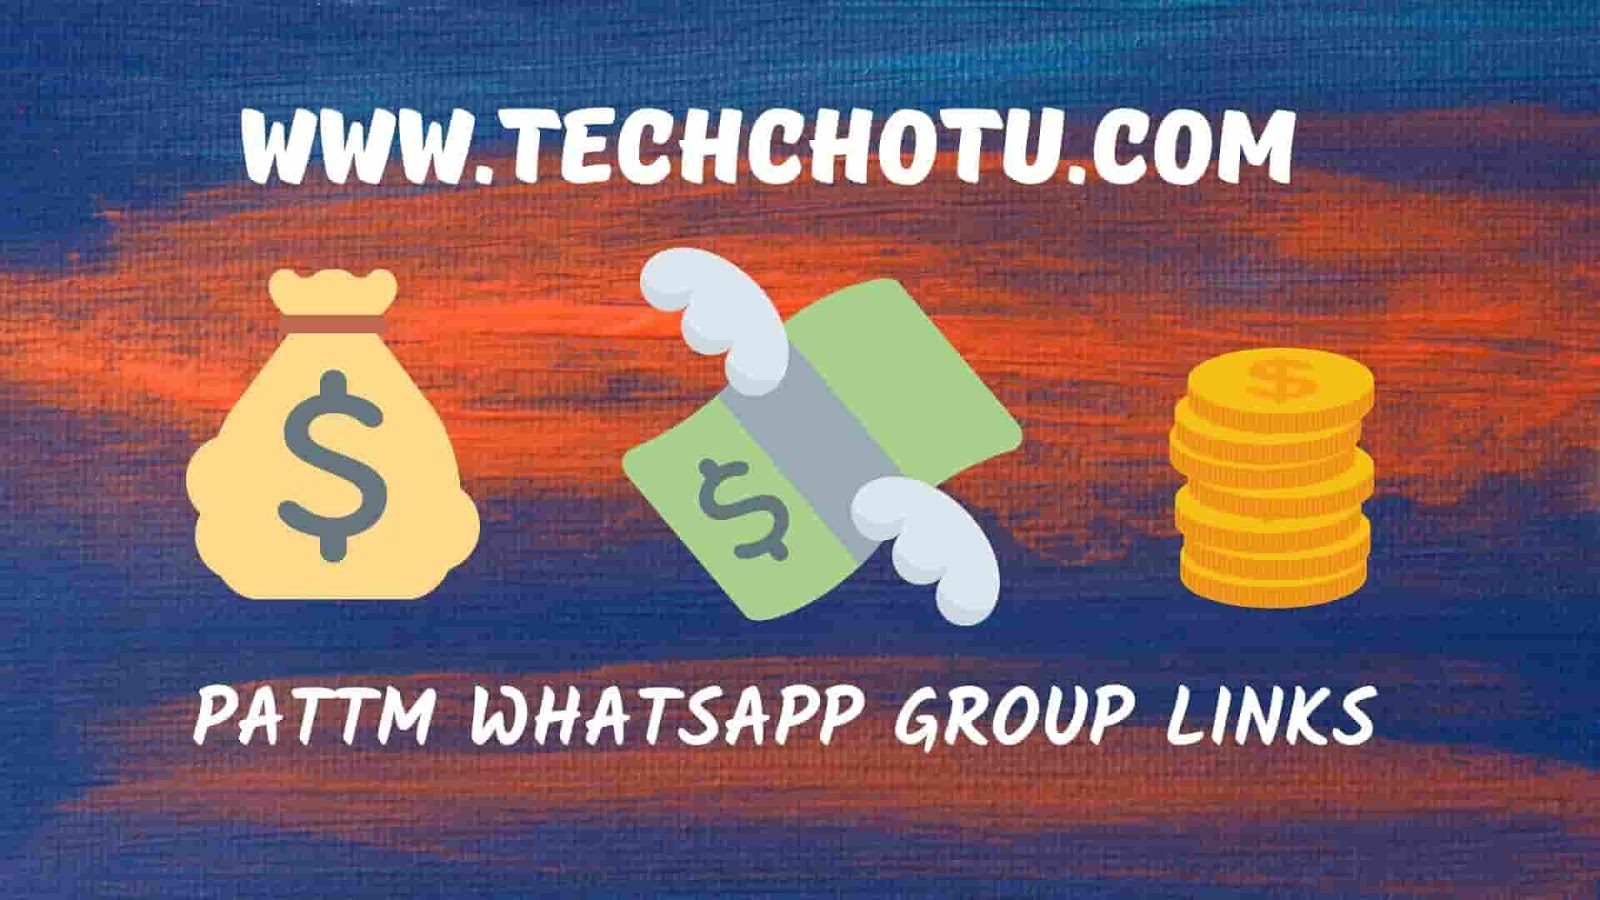 Paytm Whatsapp Groups Links List 2019 - TECHCHOTU 2019